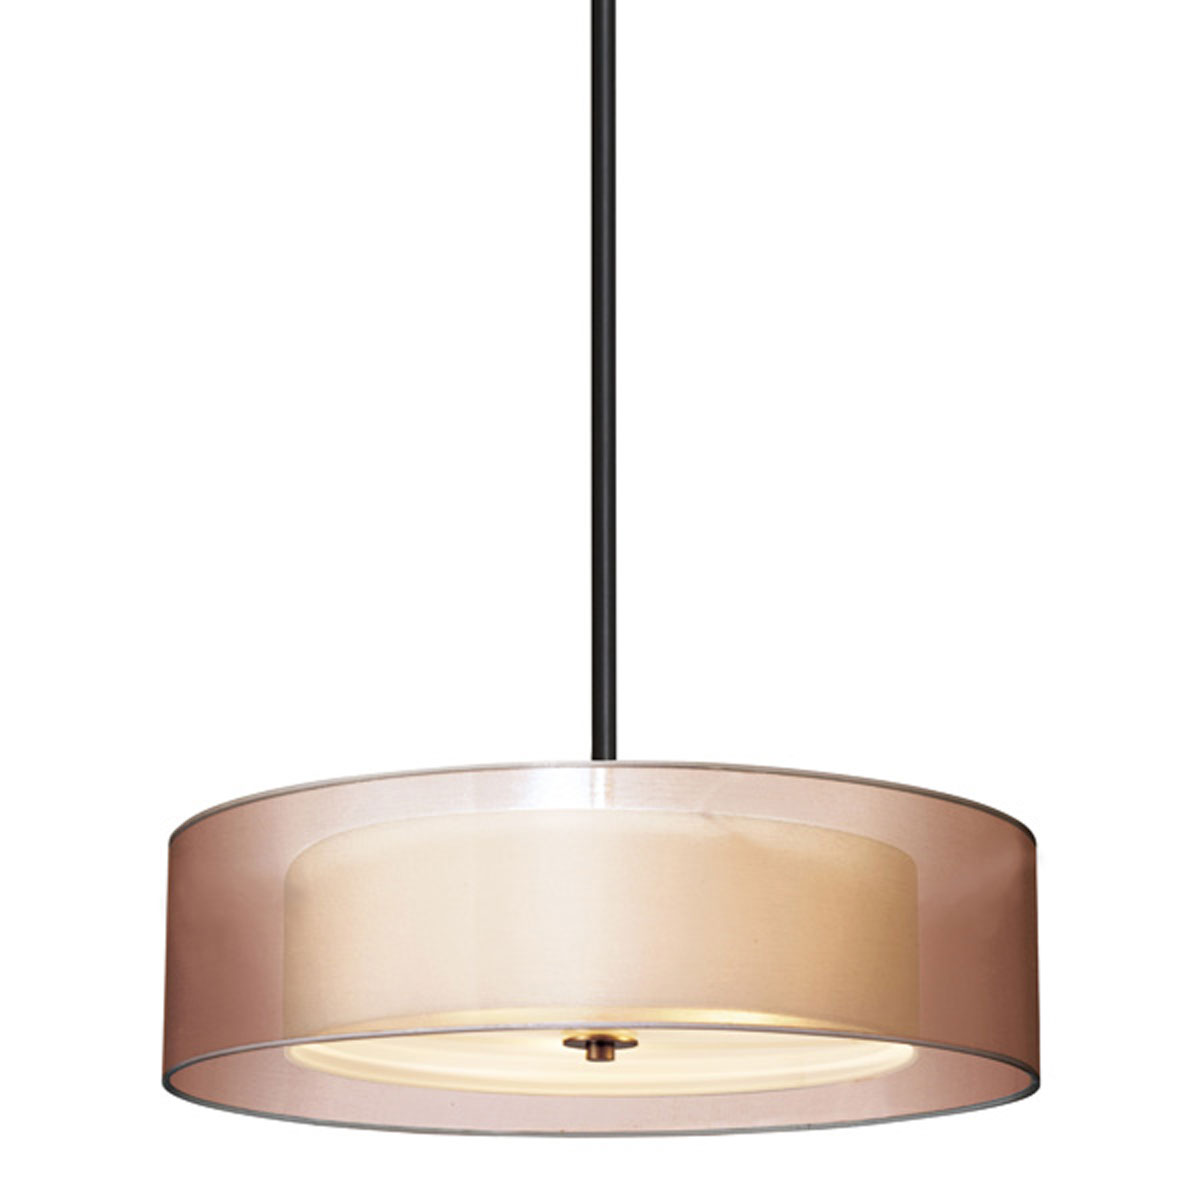 pendant by sonneman  a way of light   - puri pendant by sonneman  a way of light